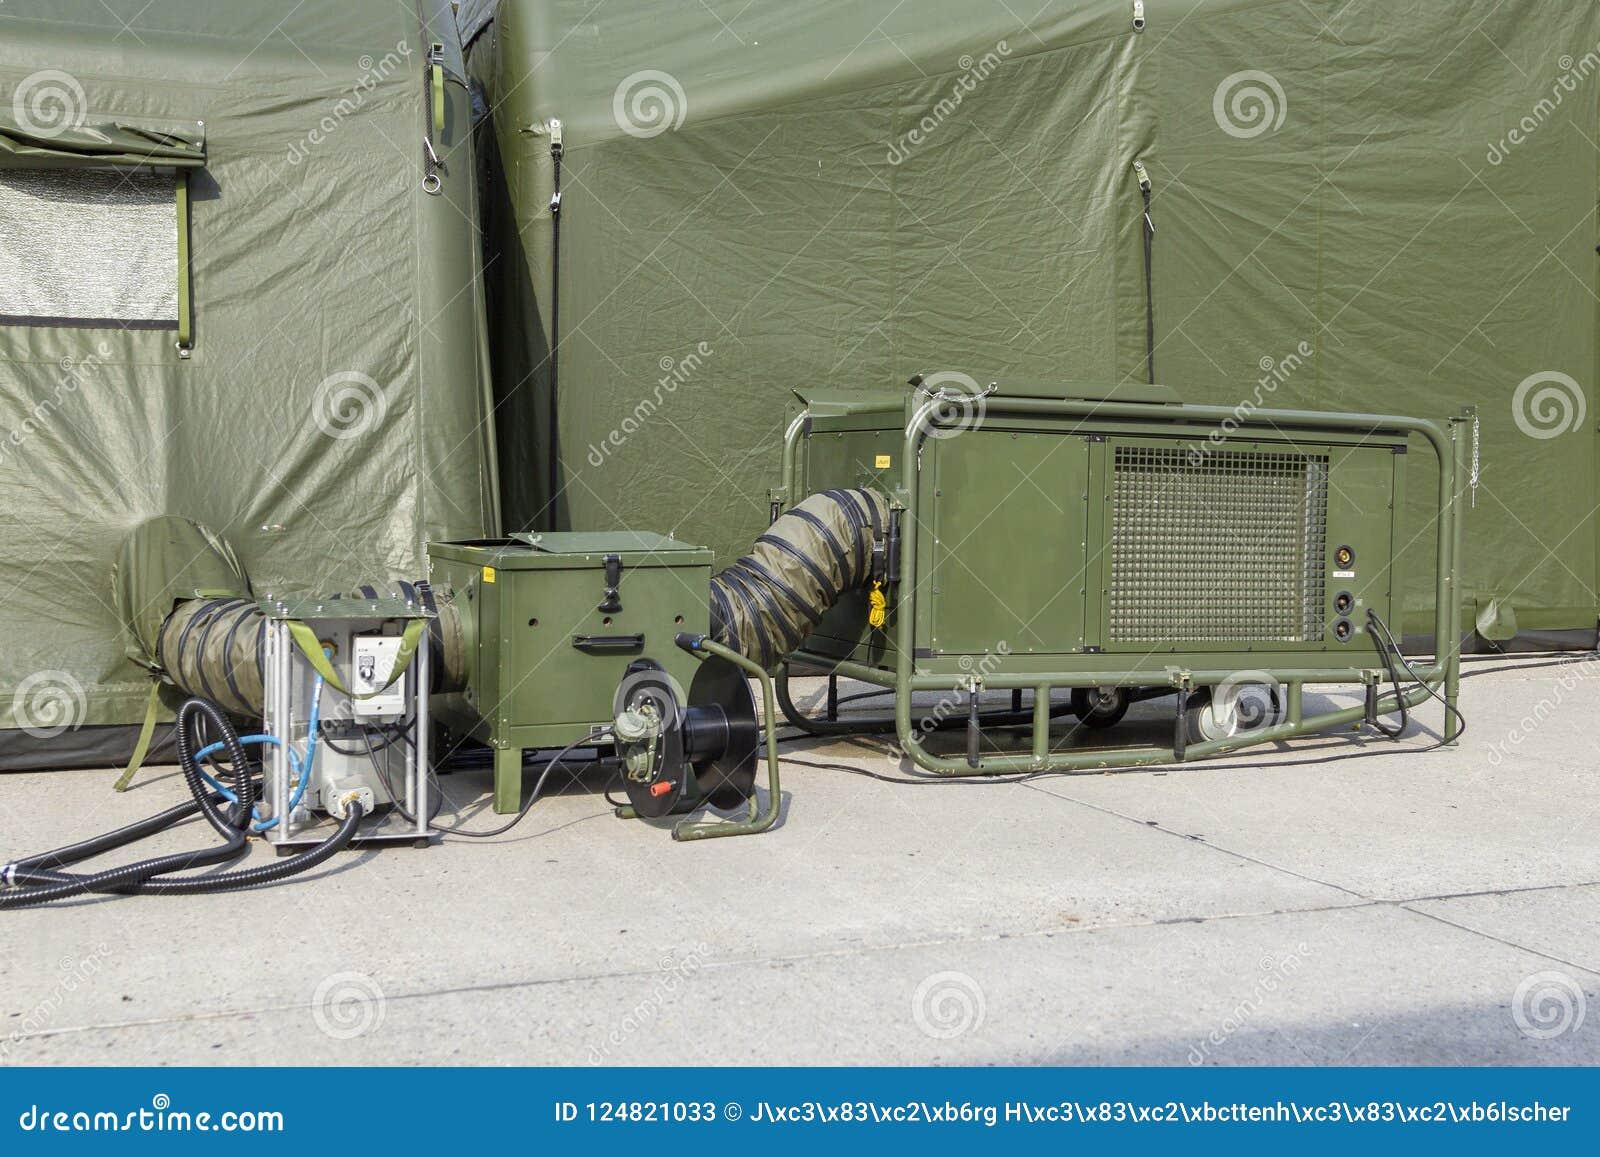 German military field hospital